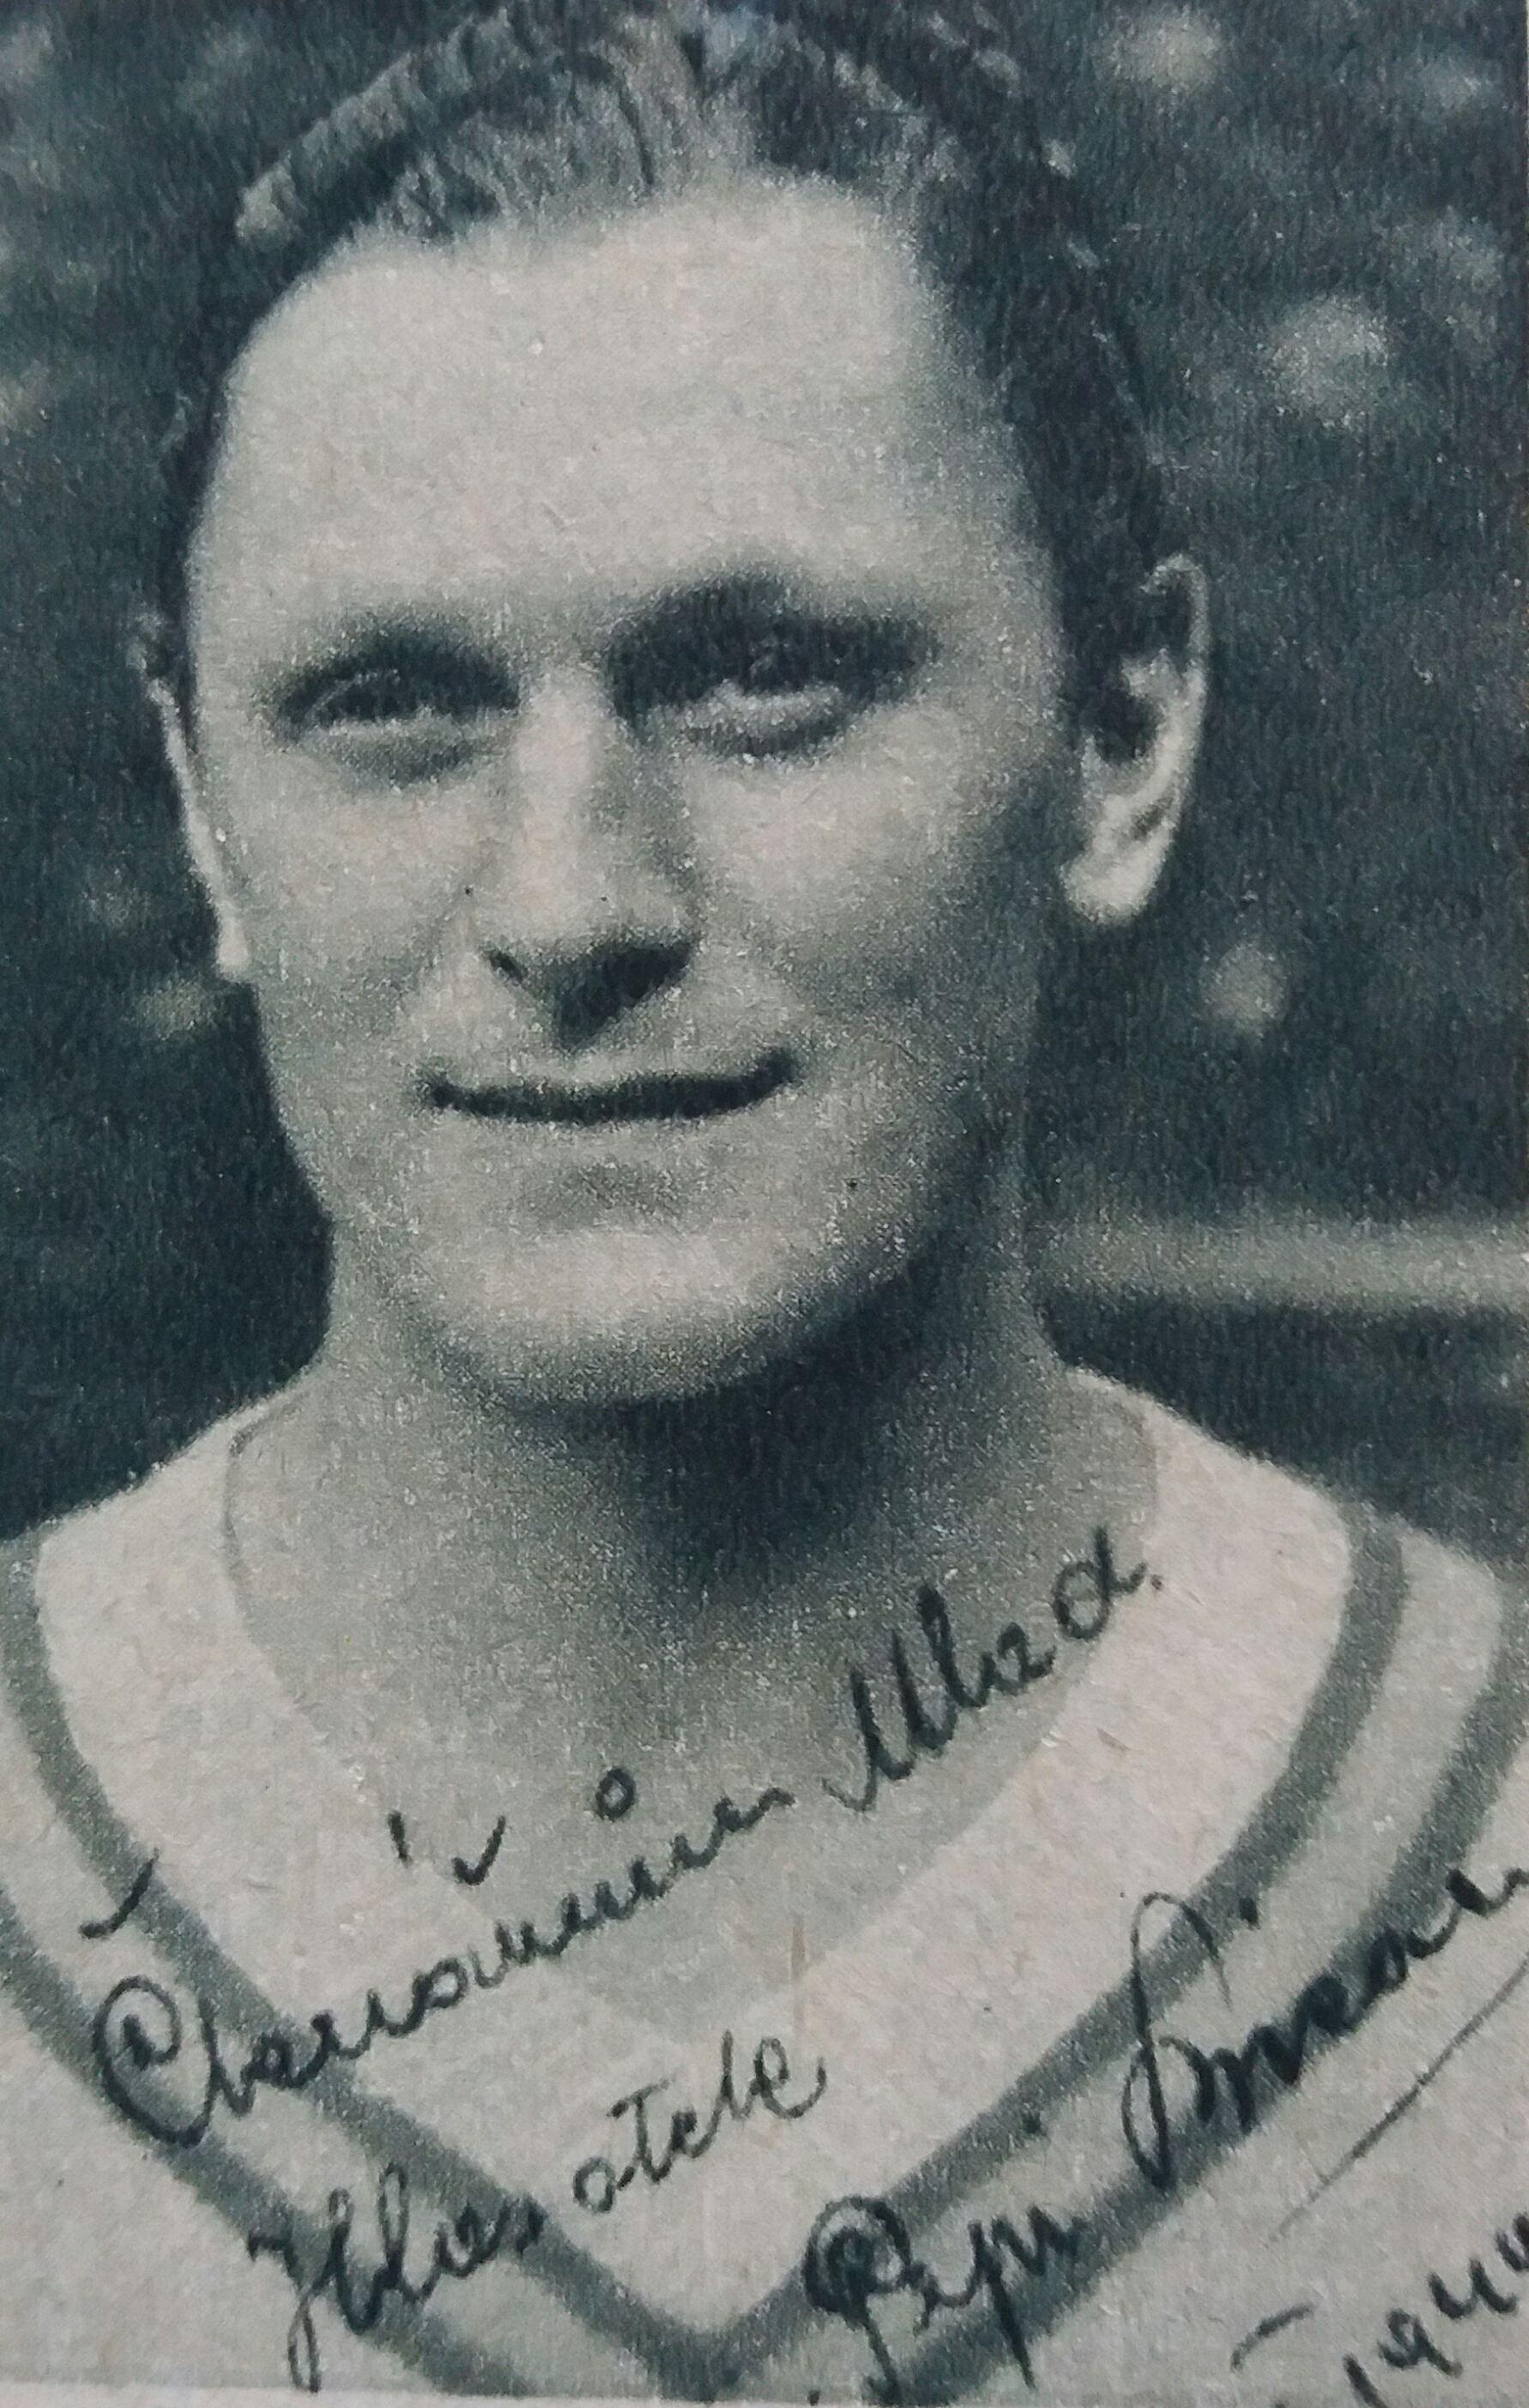 Footballing forgotten great Josef Bican